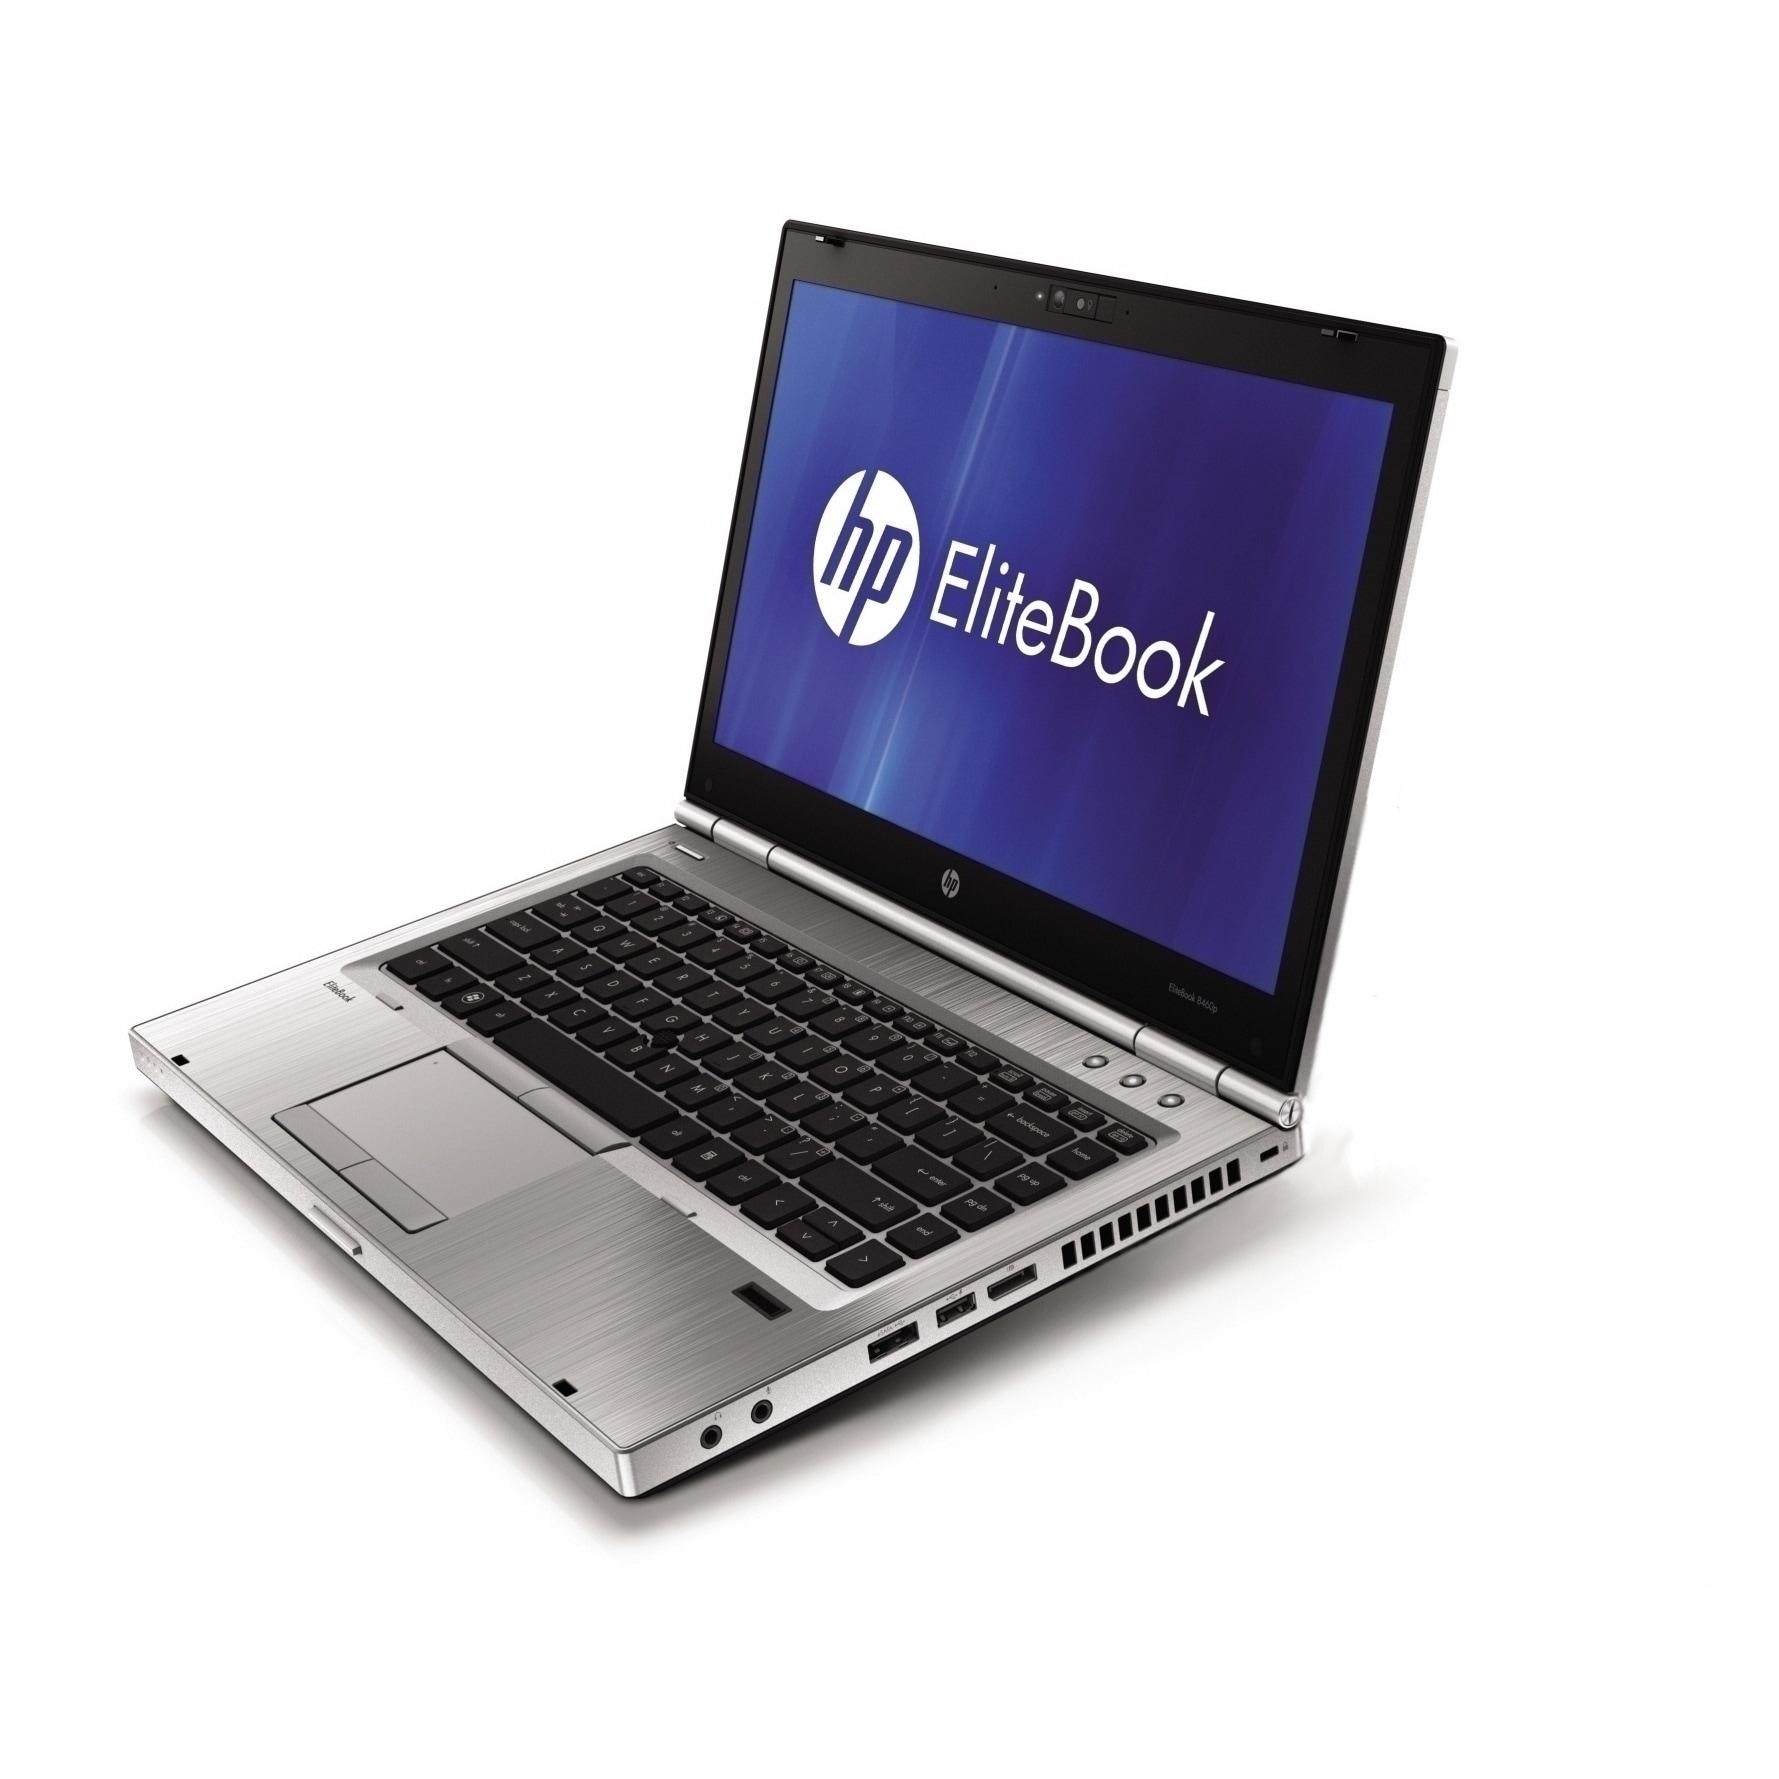 Shop HP EliteBook 8460p 14-inch 2.5GHz Intel Core i5 2GB RAM 250GB Windows  7 Professional 32-Bit Silver Laptop (Refurbished) - Free Shipping Today ...